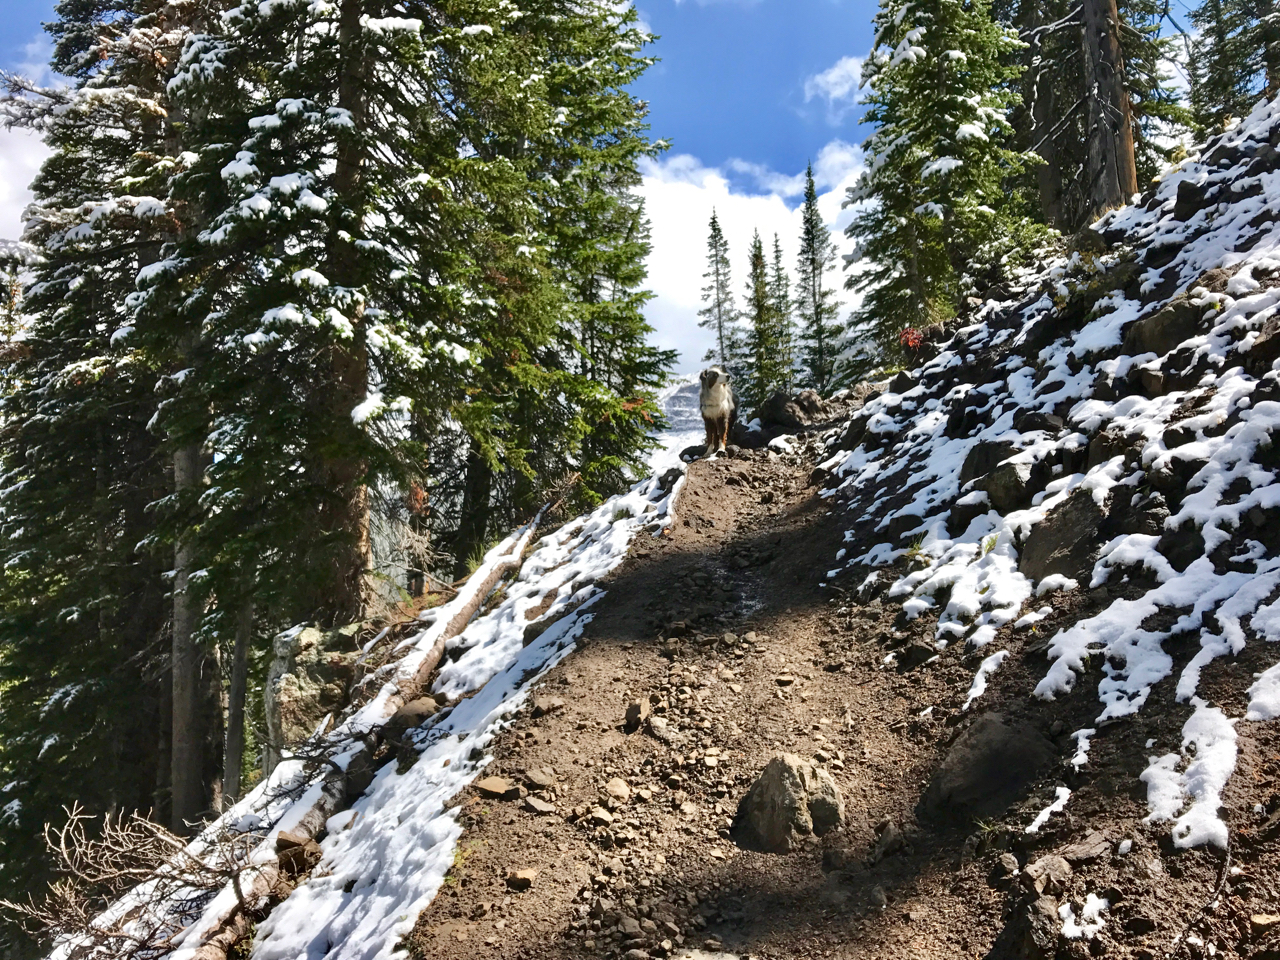 Snow on the Climb